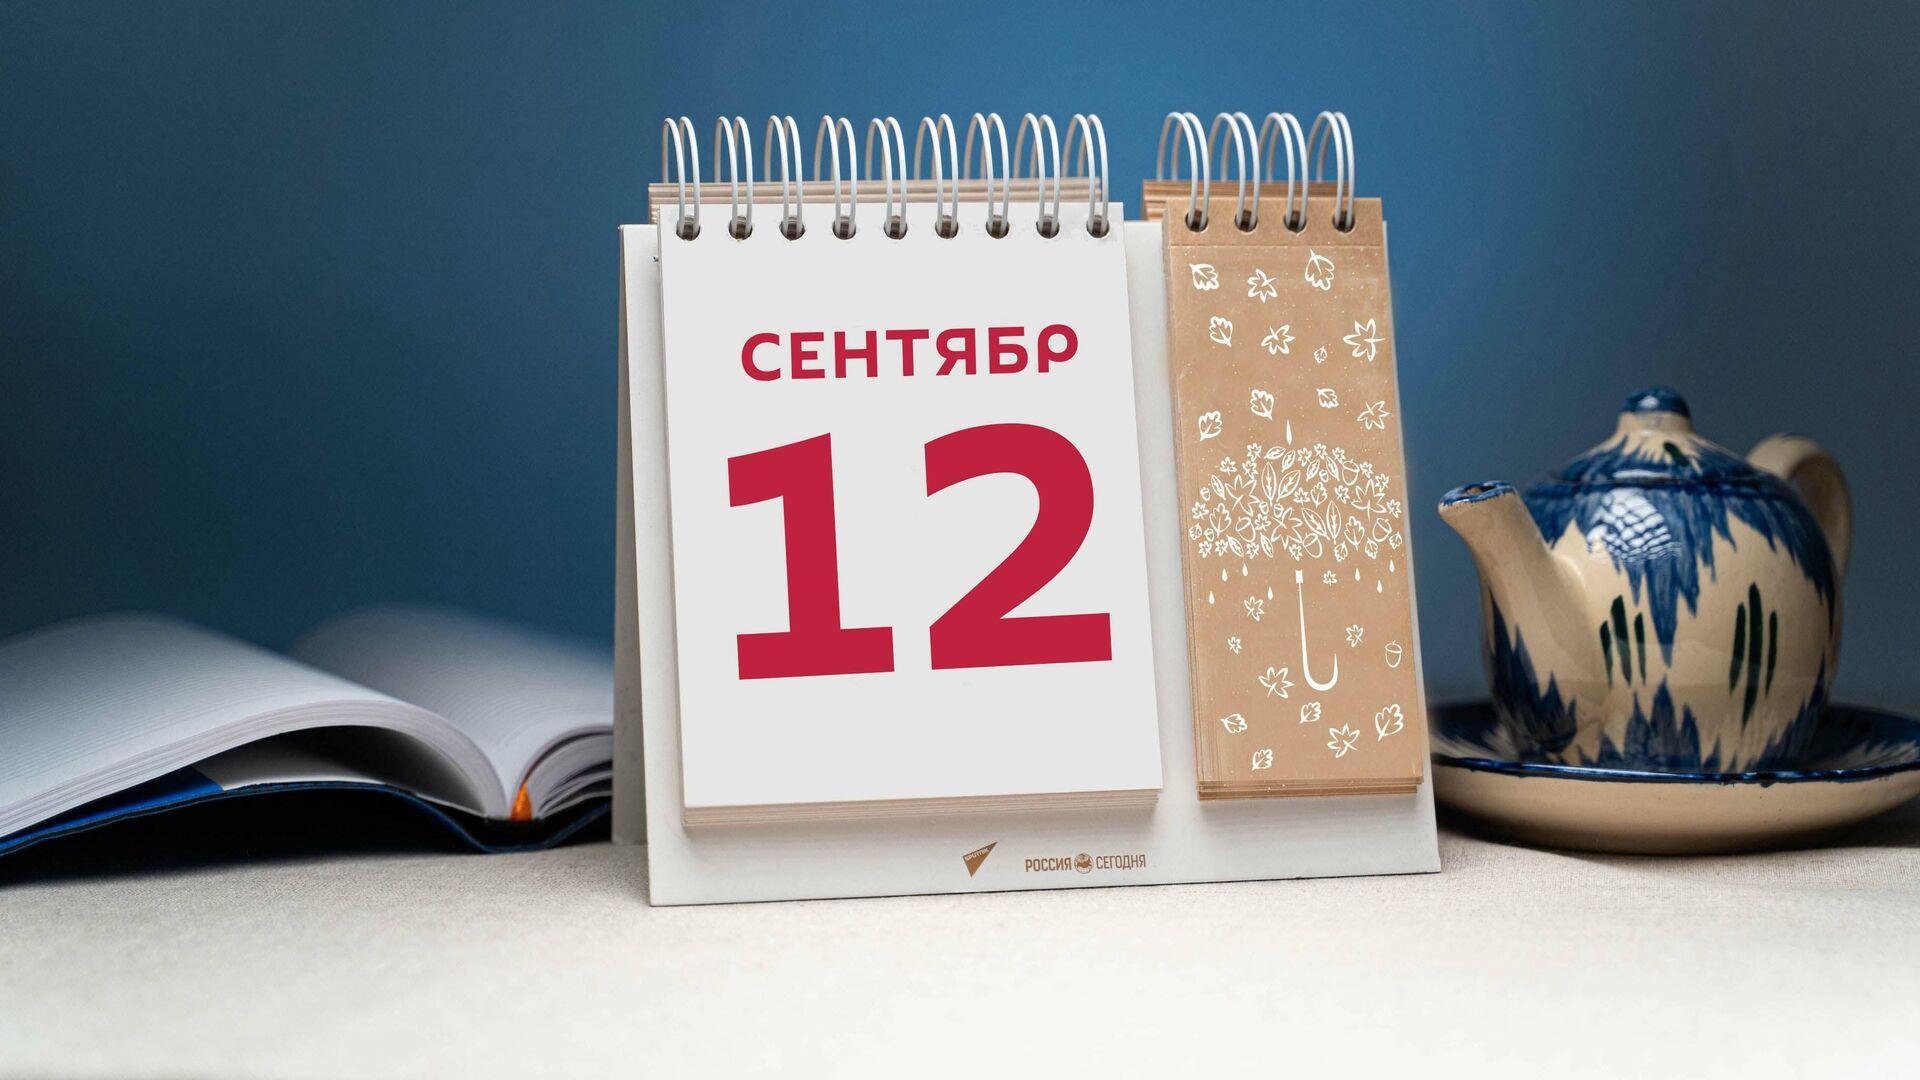 День 12 сентября - Sputnik Тоҷикистон, 1920, 12.09.2021